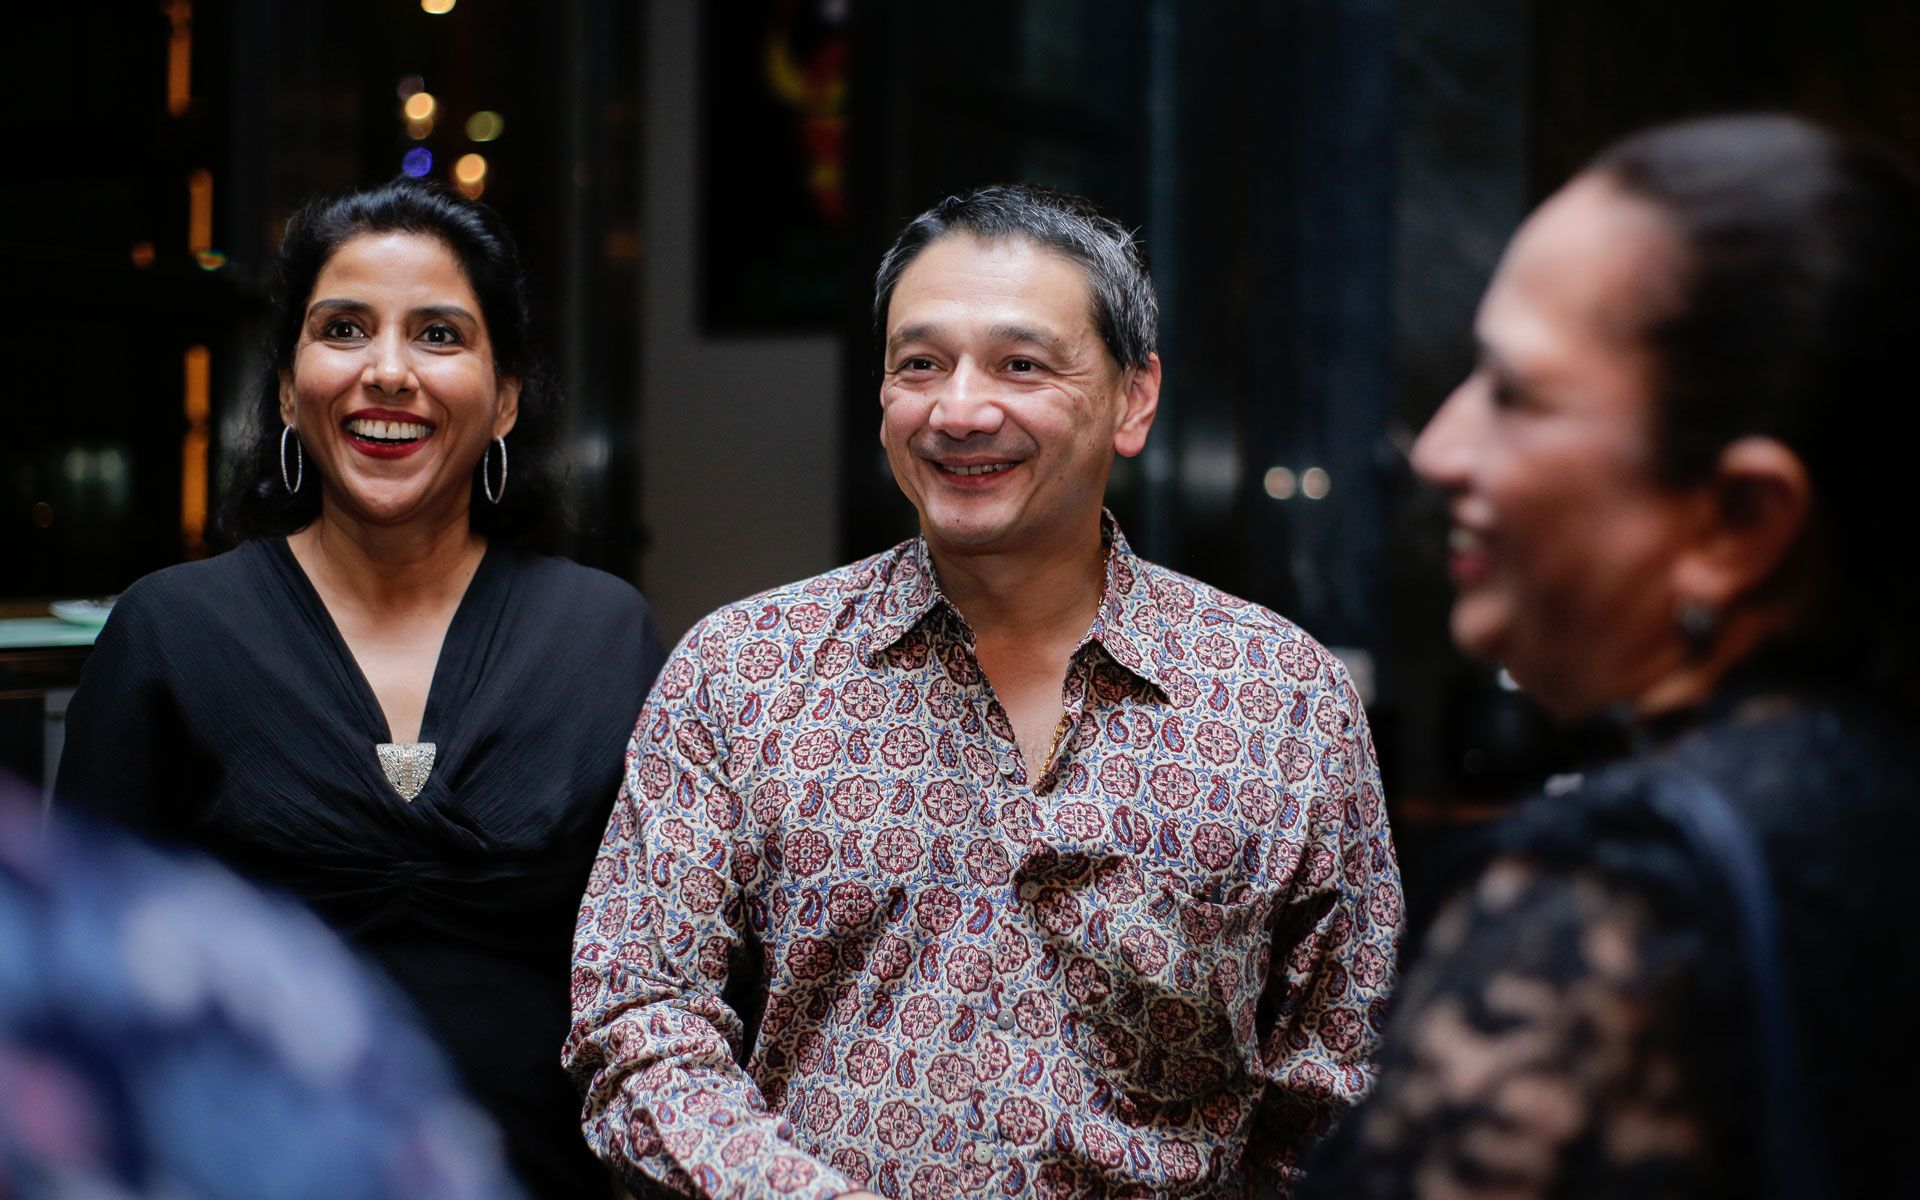 Datin Shalini Ganendra and  Dato' Ir Dennis Ganendra